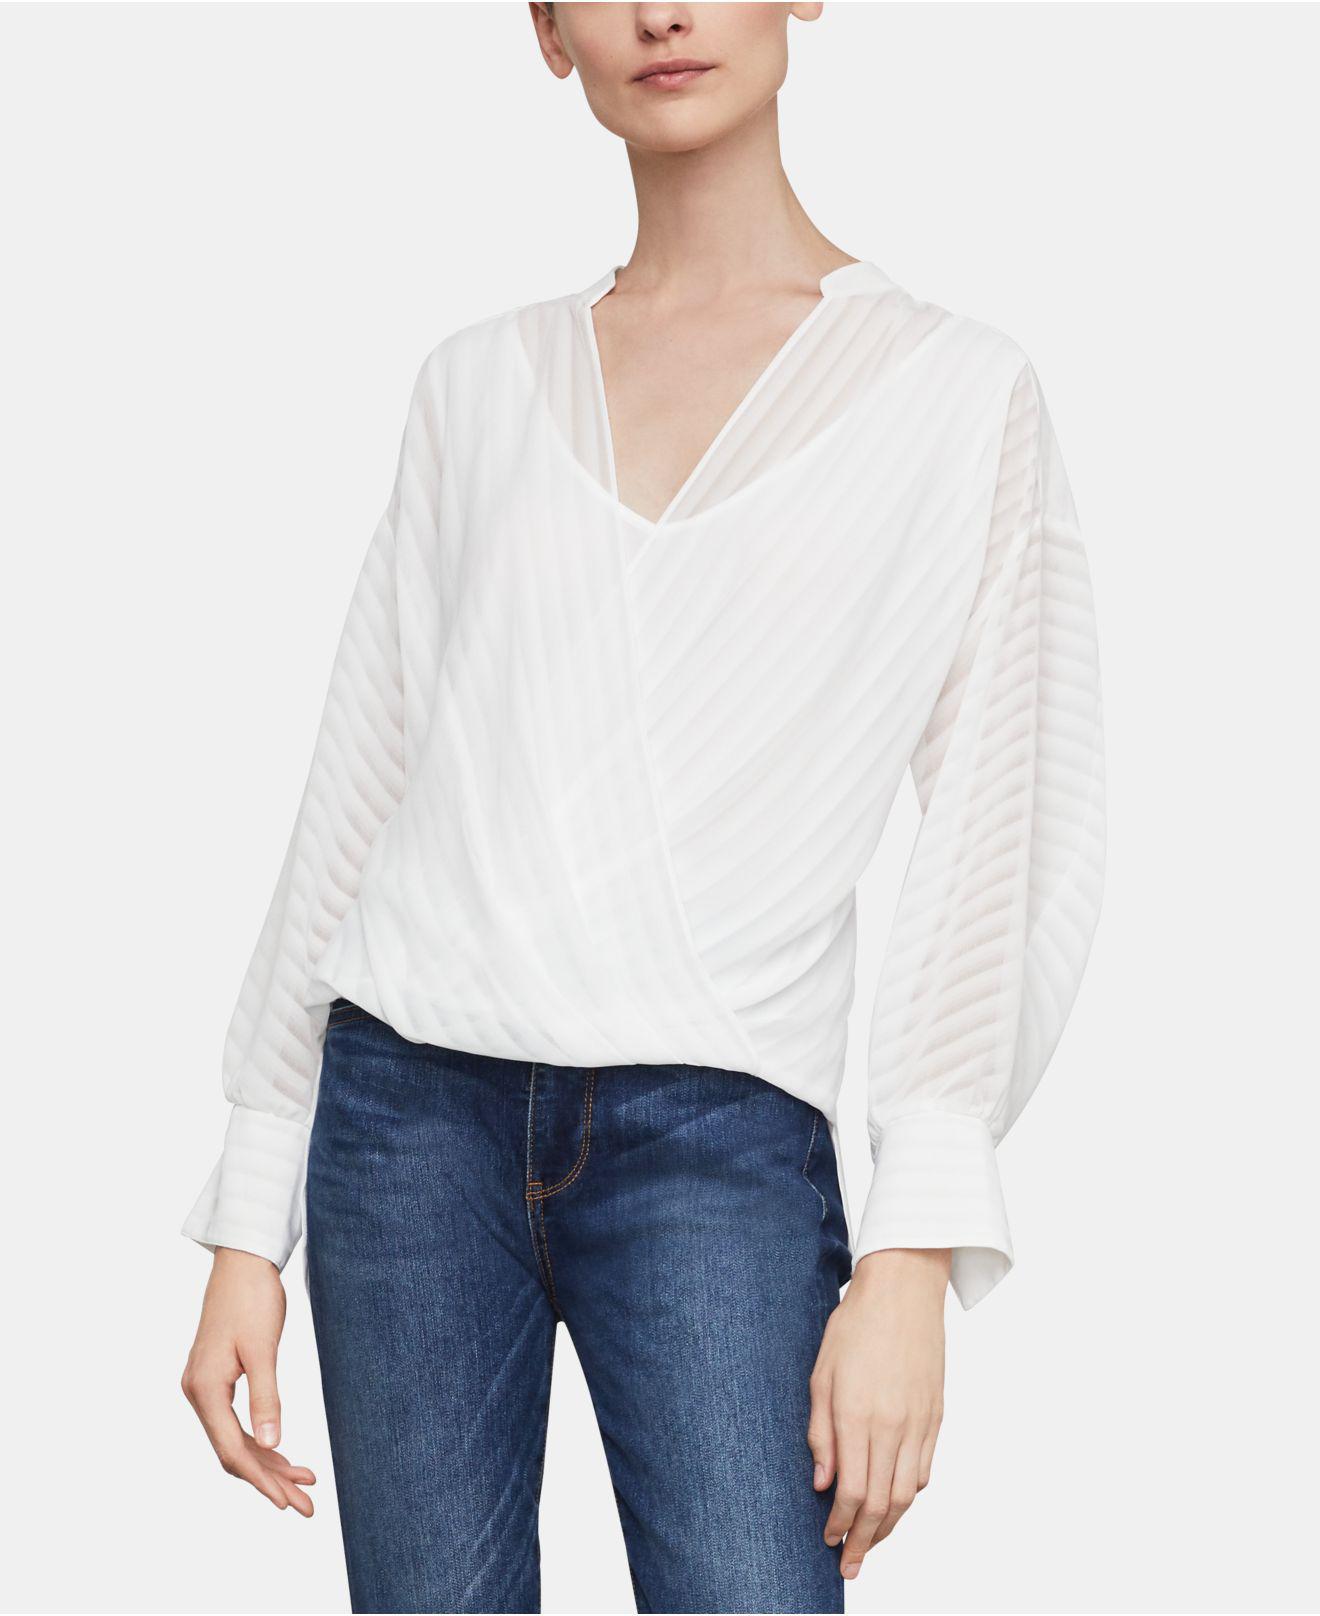 31968a72841f1 Lyst - BCBGMAXAZRIA Faux-wrap Chiffon Top in White